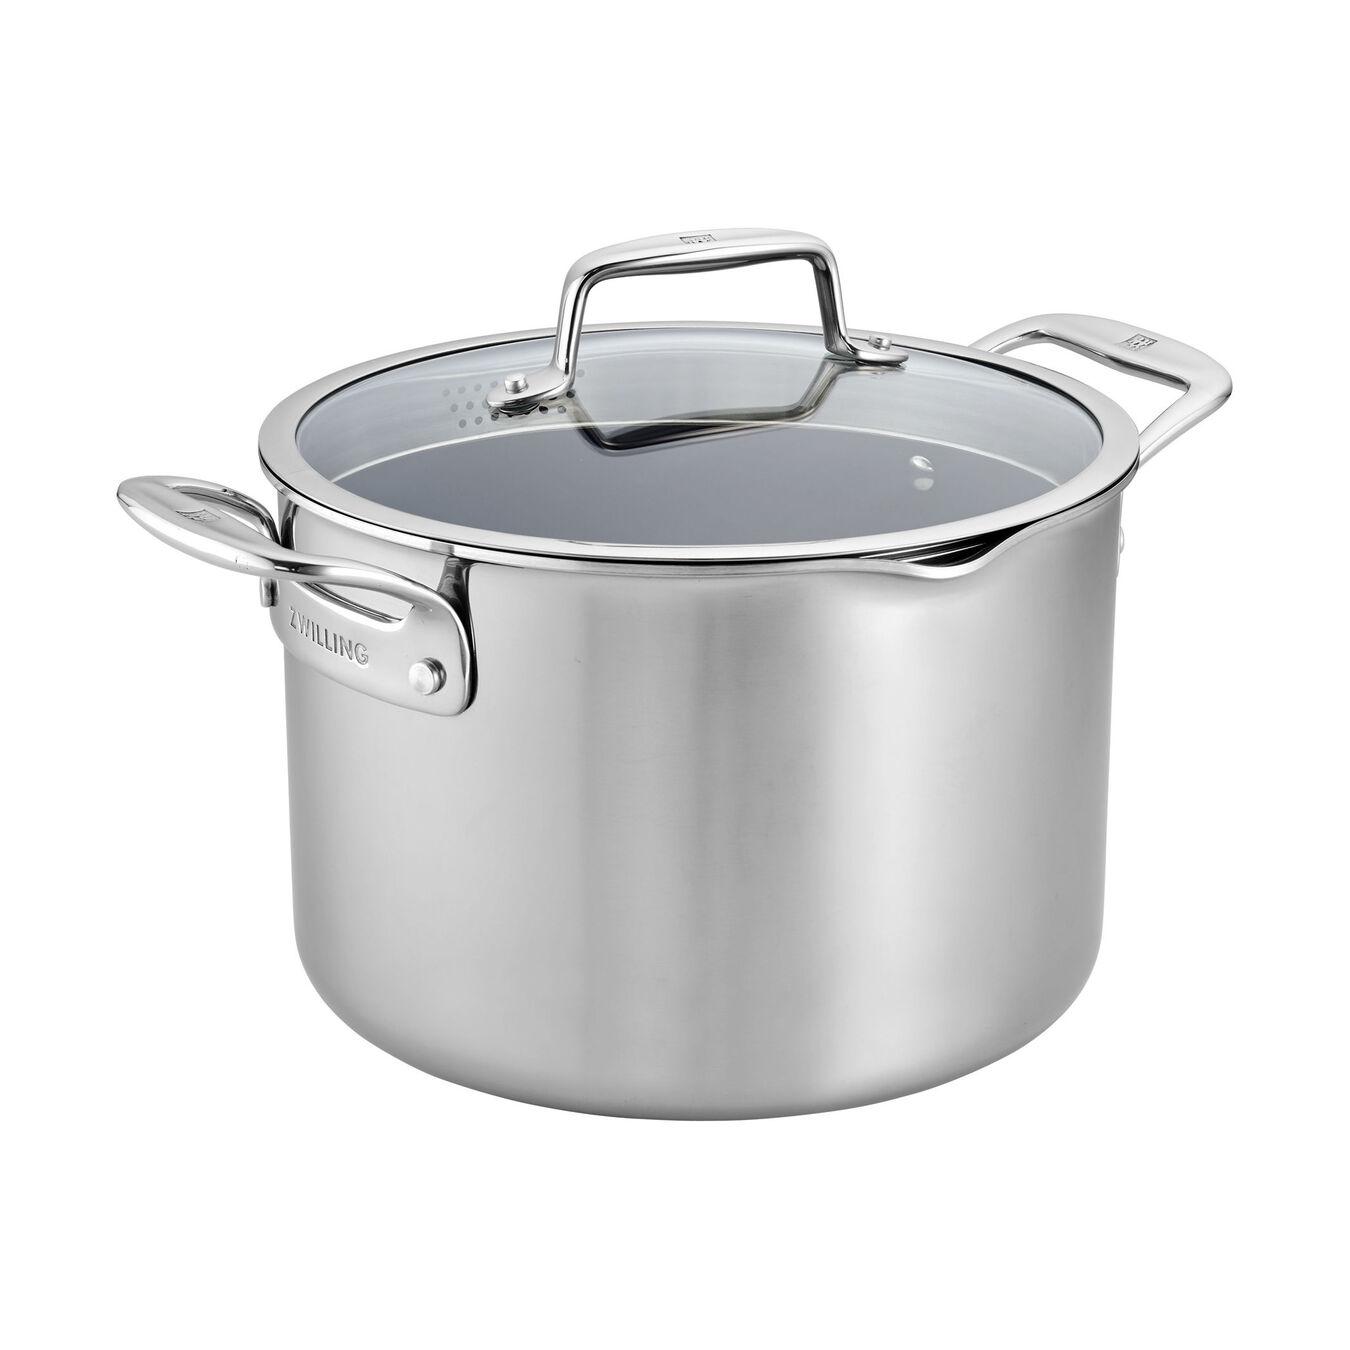 8-qt Stainless Steel Ceramic Nonstick Stock Pot,,large 1